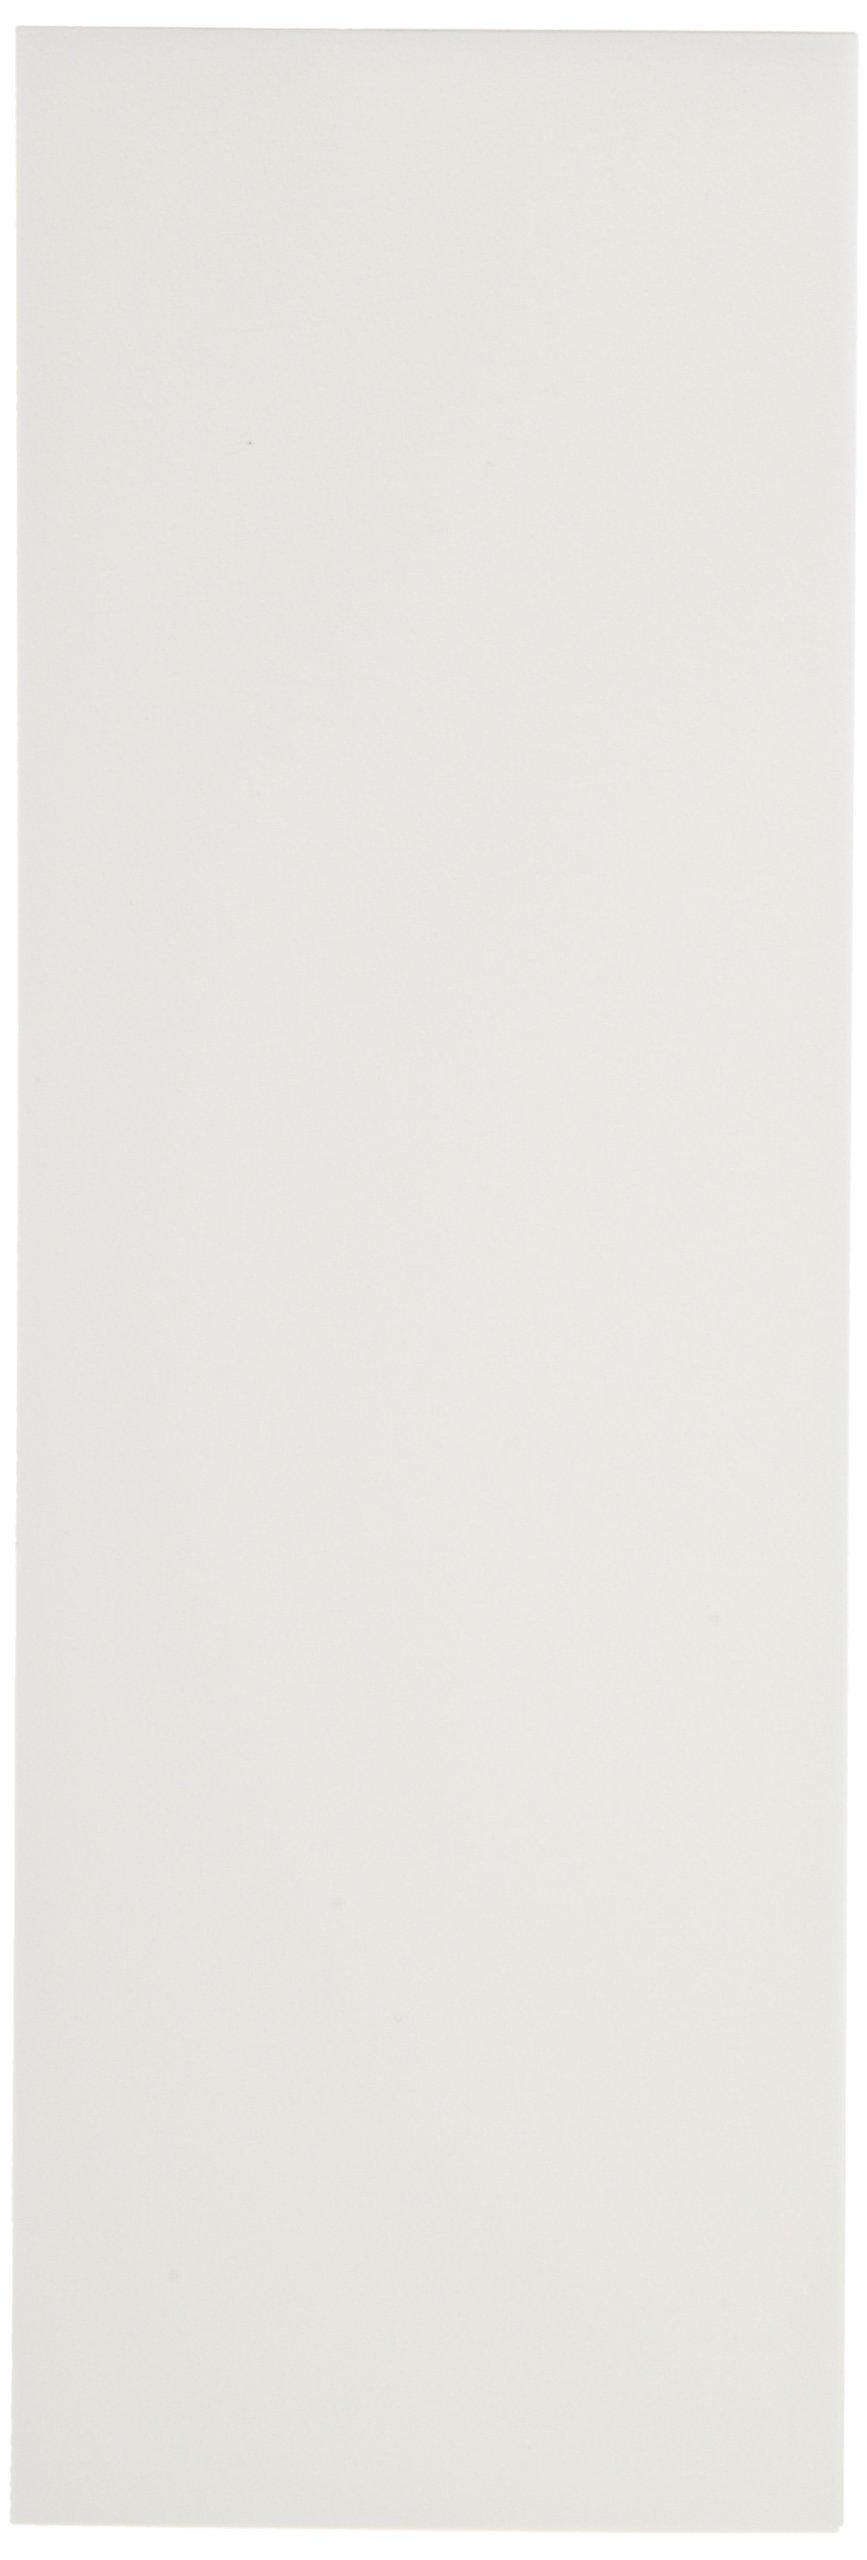 GE Whatman 3001-845 Grade 1 Chr Cellulose Chromatography Paper Sheet, 10cm Width, 30cm Length (Pack of 100)